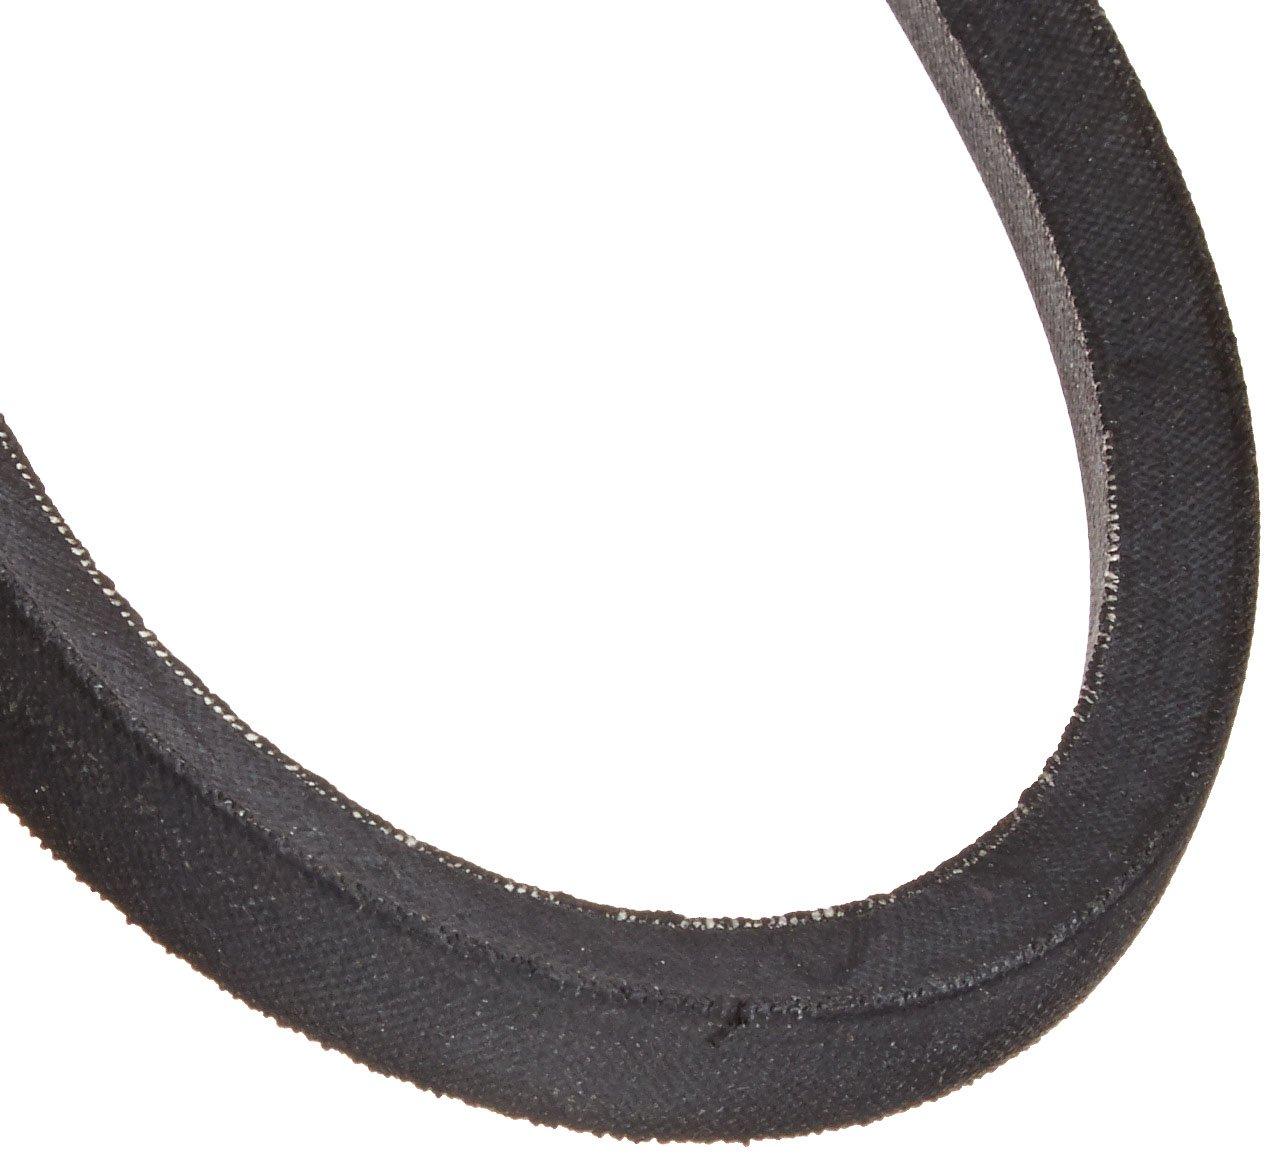 D/&D PowerDrive D832-8M-20 Double Sided Timing Belt